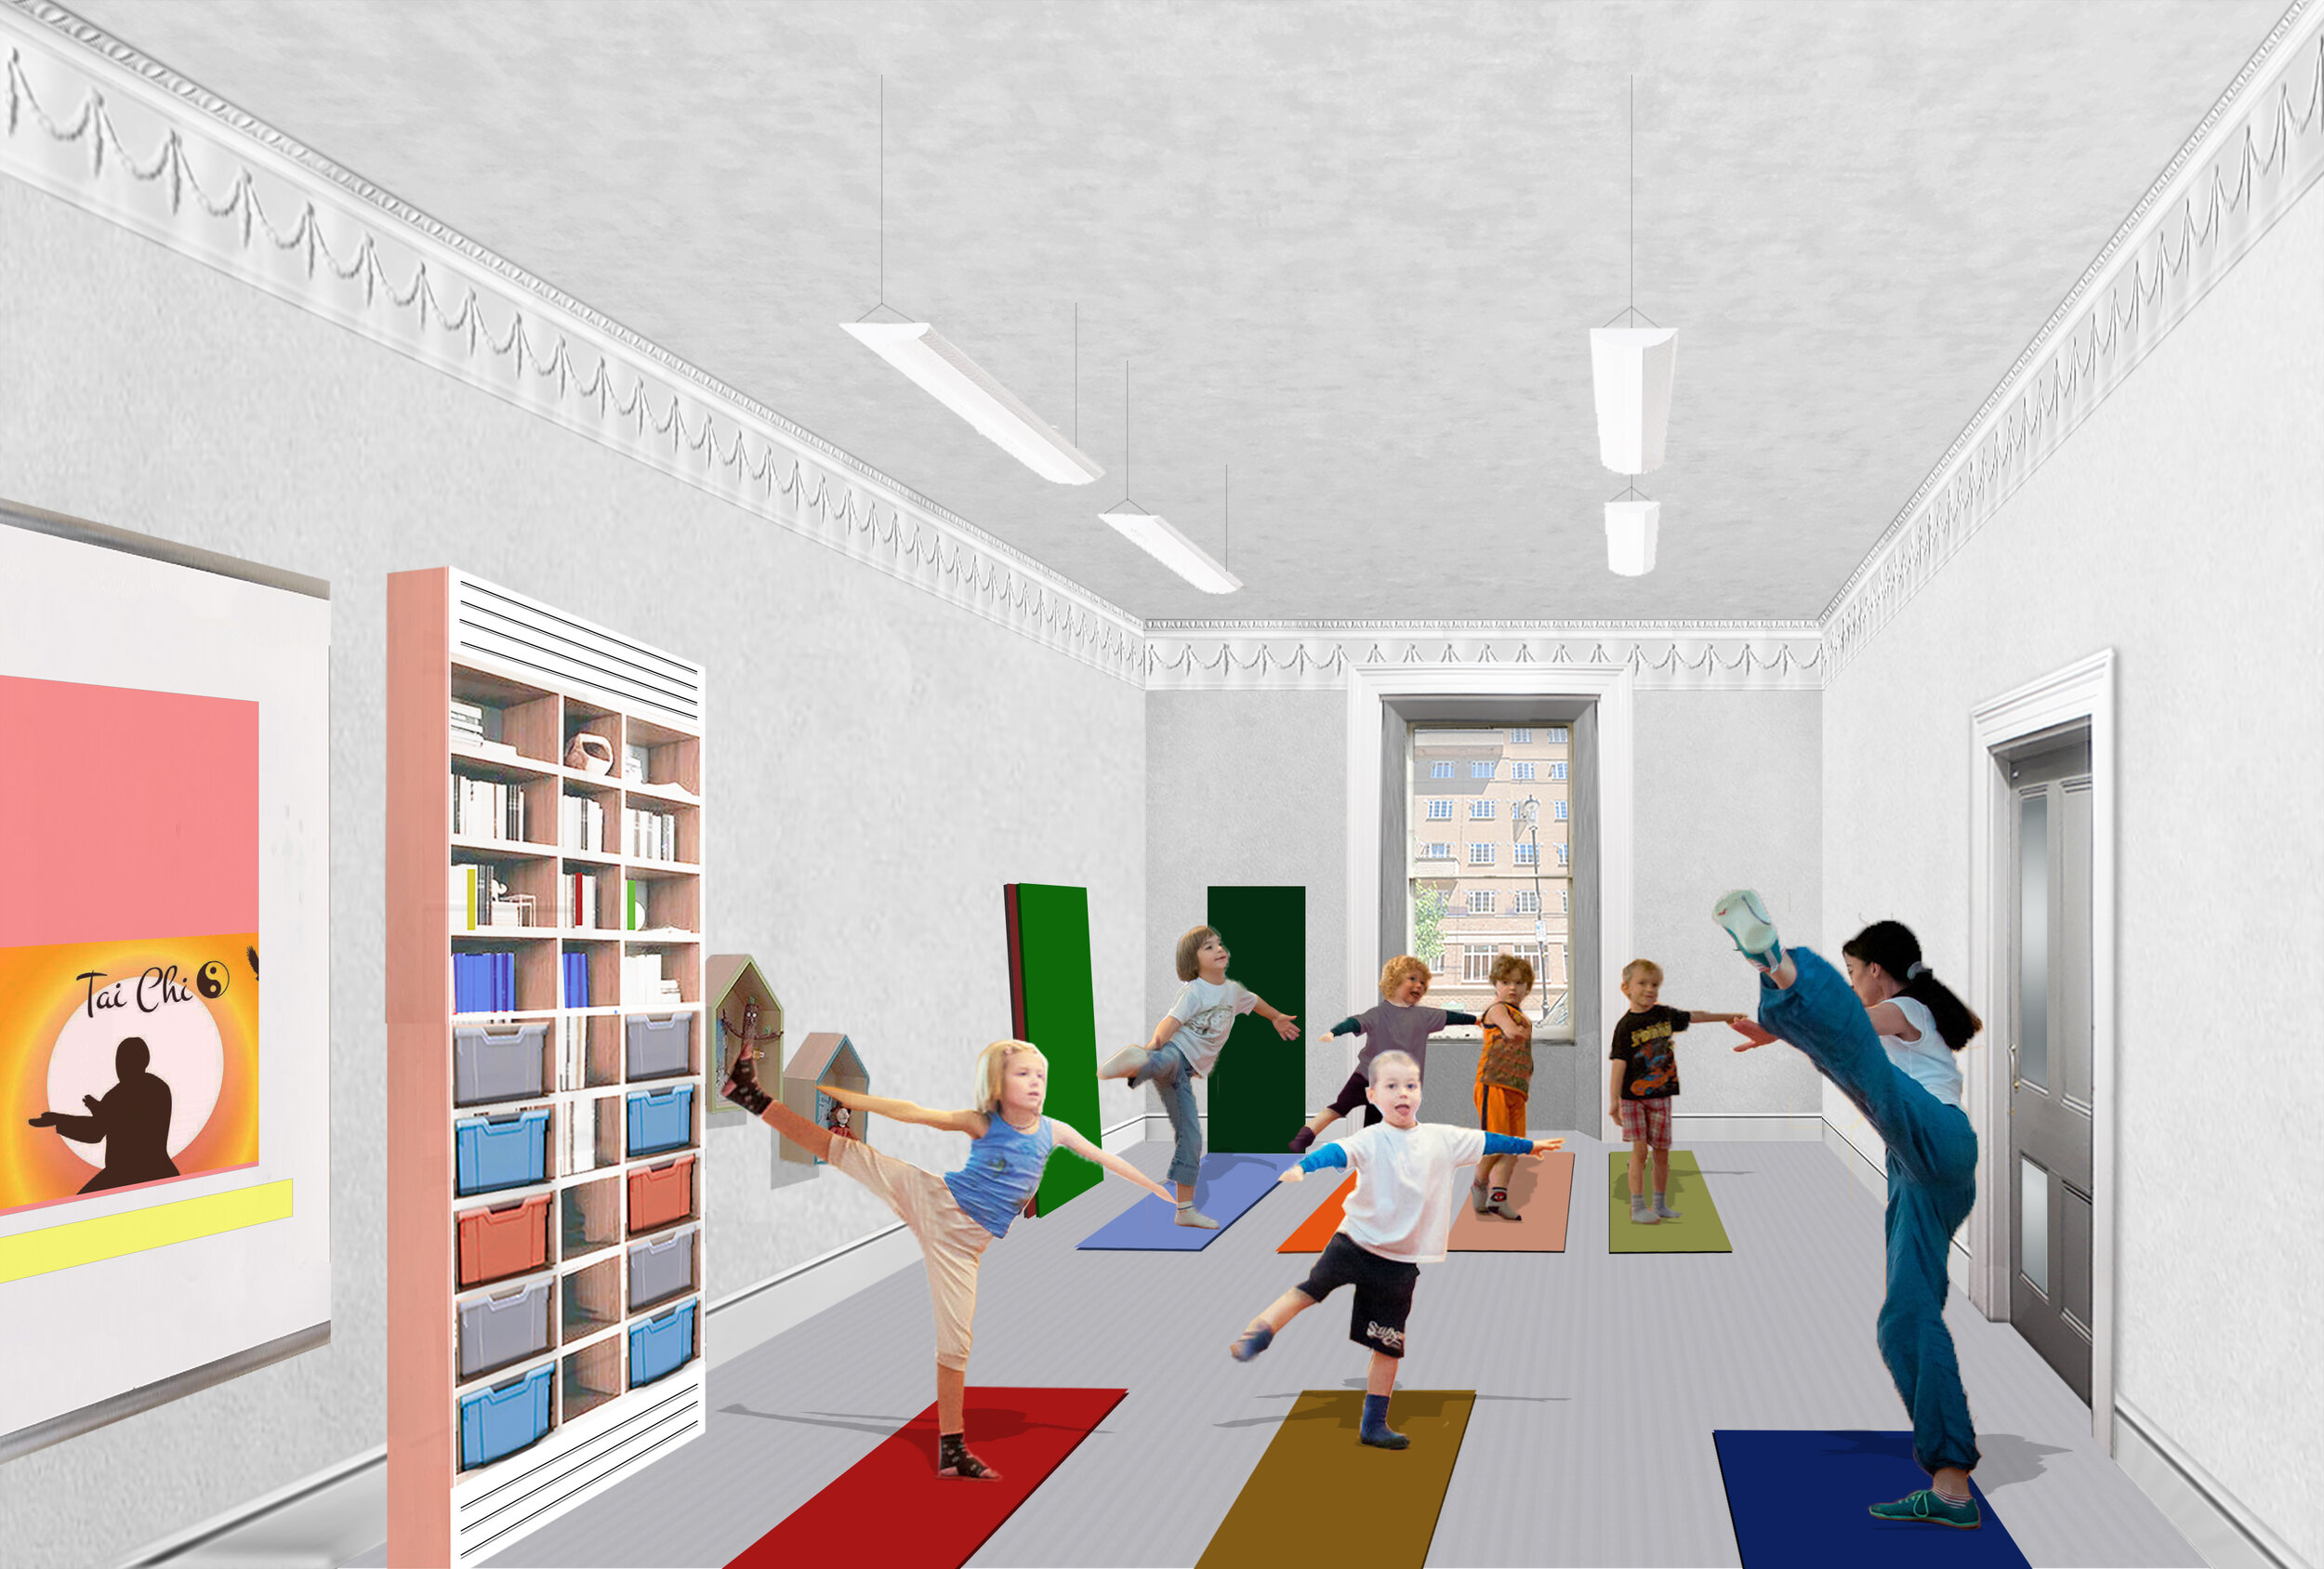 17015_Proposed classroom_taichi KIDS_DRAFT 16 09 19.jpg